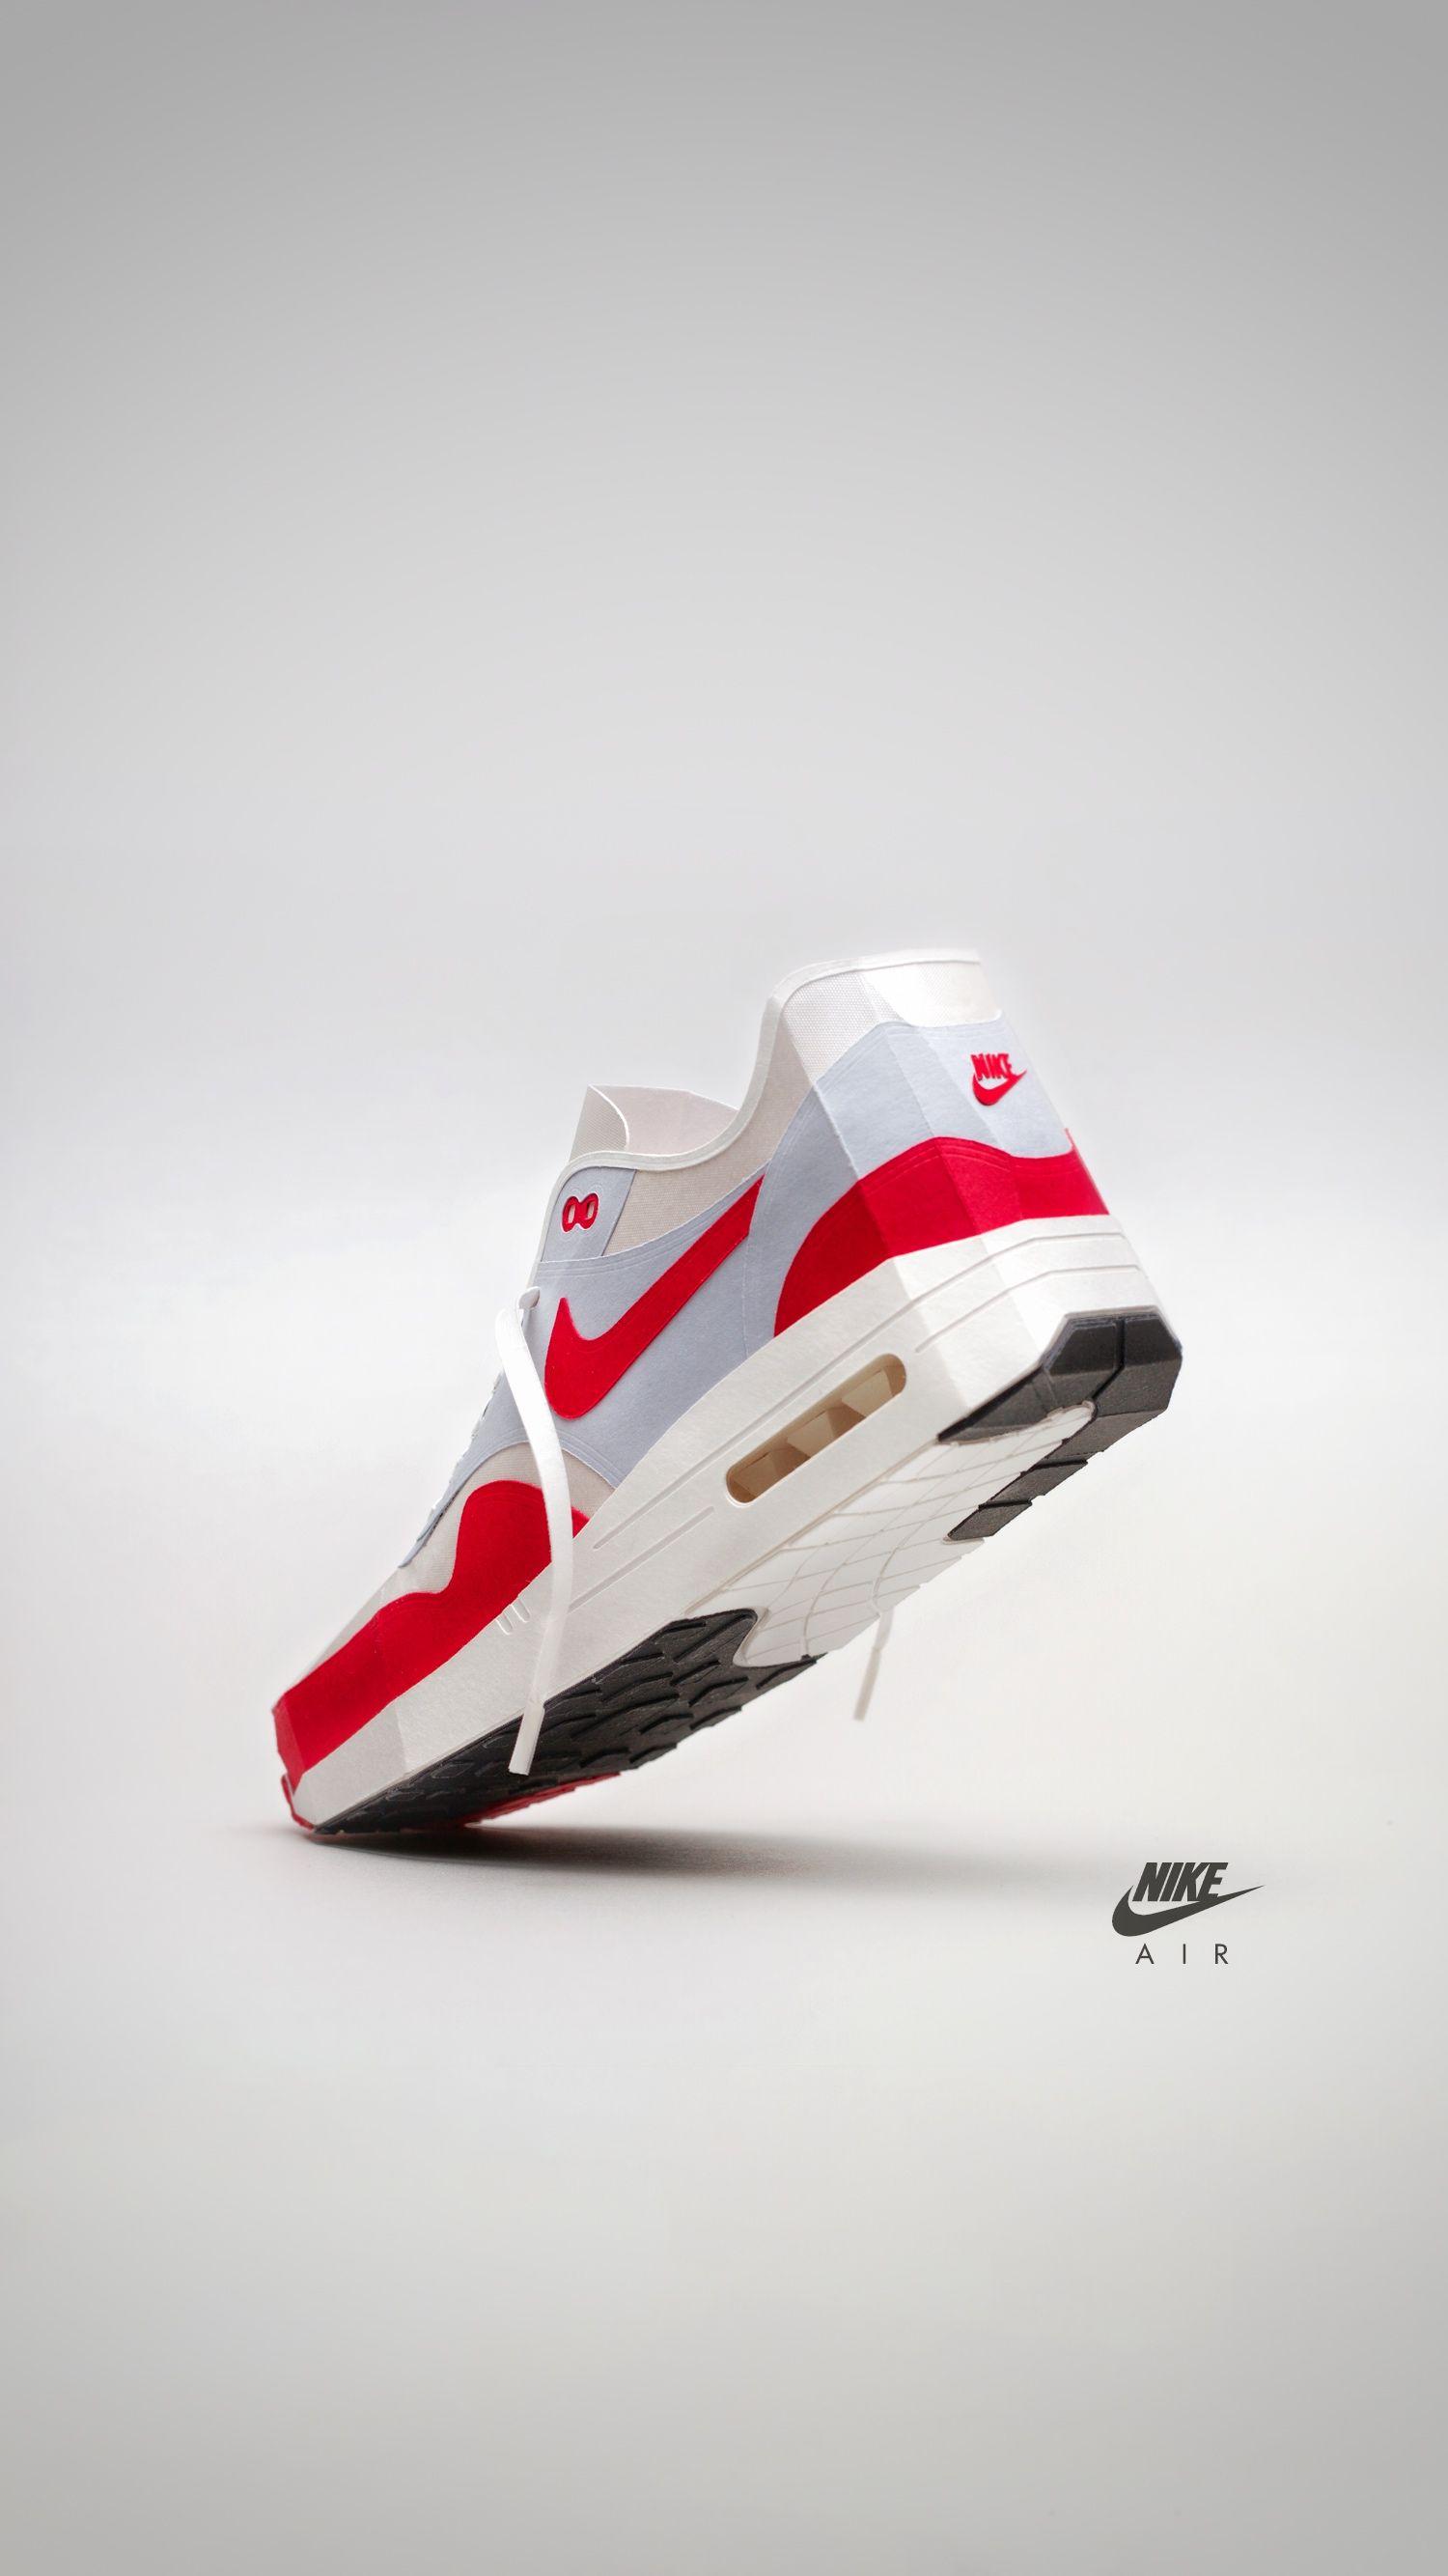 Nike Air Max 1 papercraft